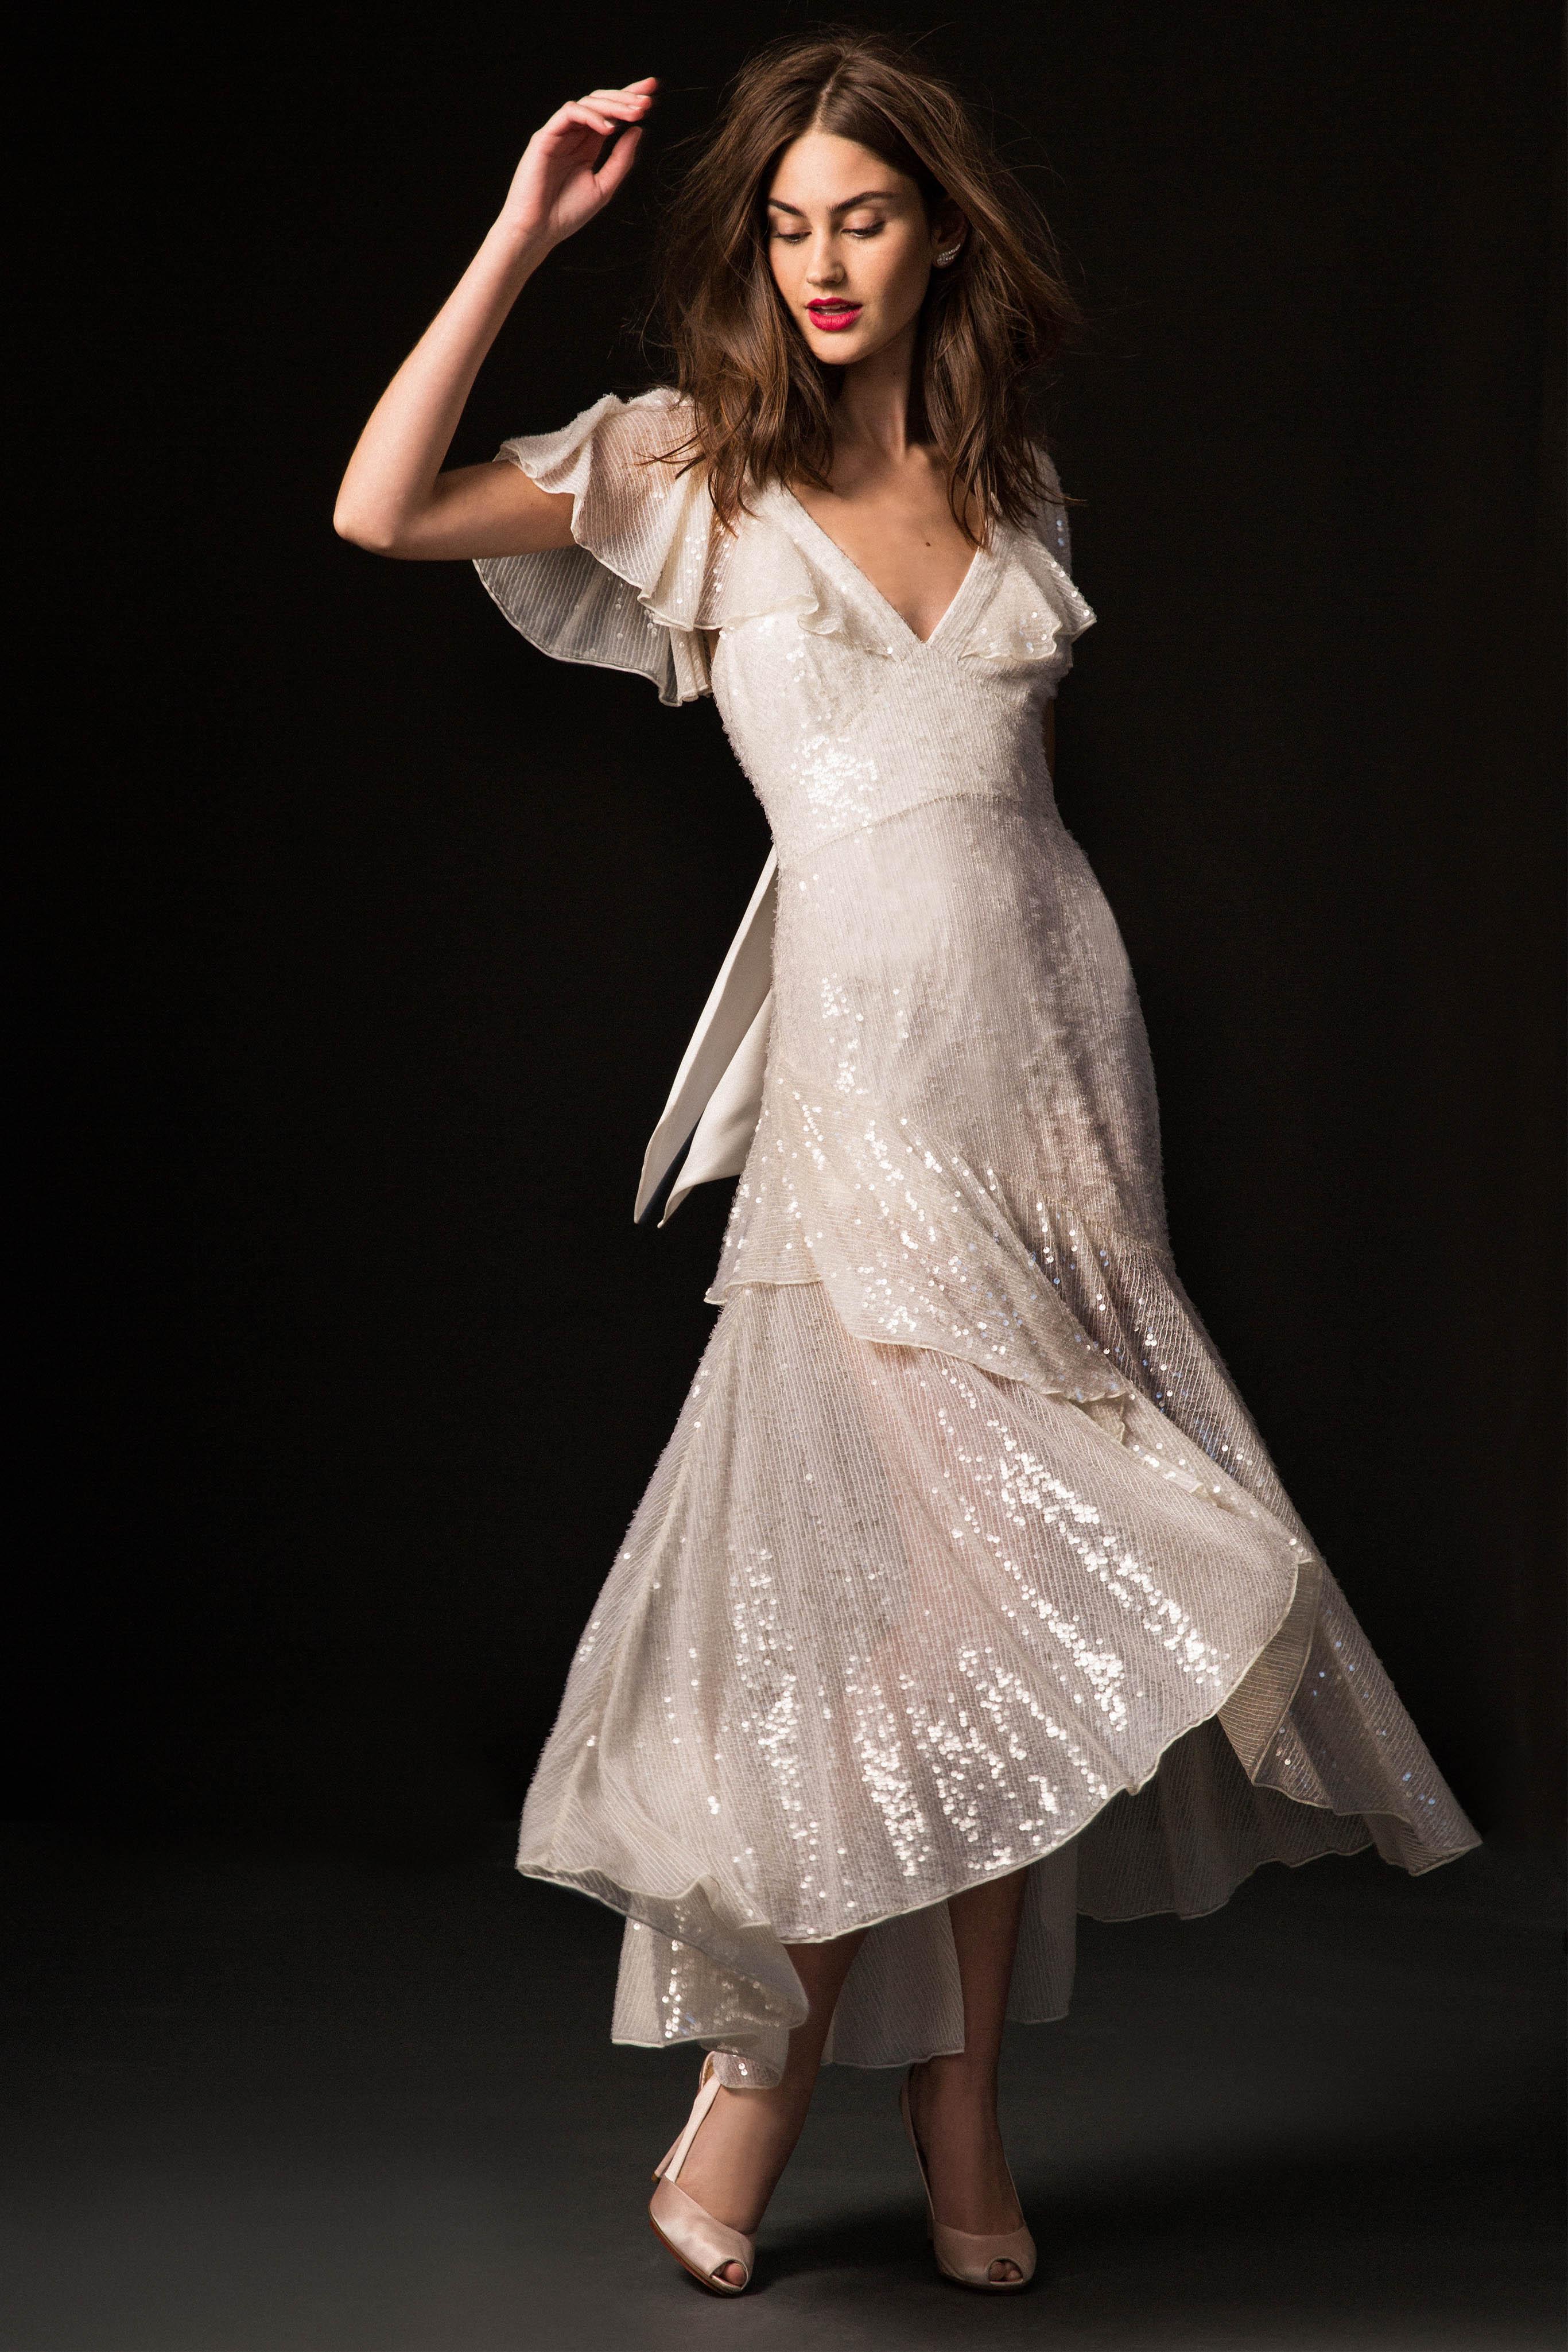 temperley fall 2019 v-neck high-low dress wedding dress